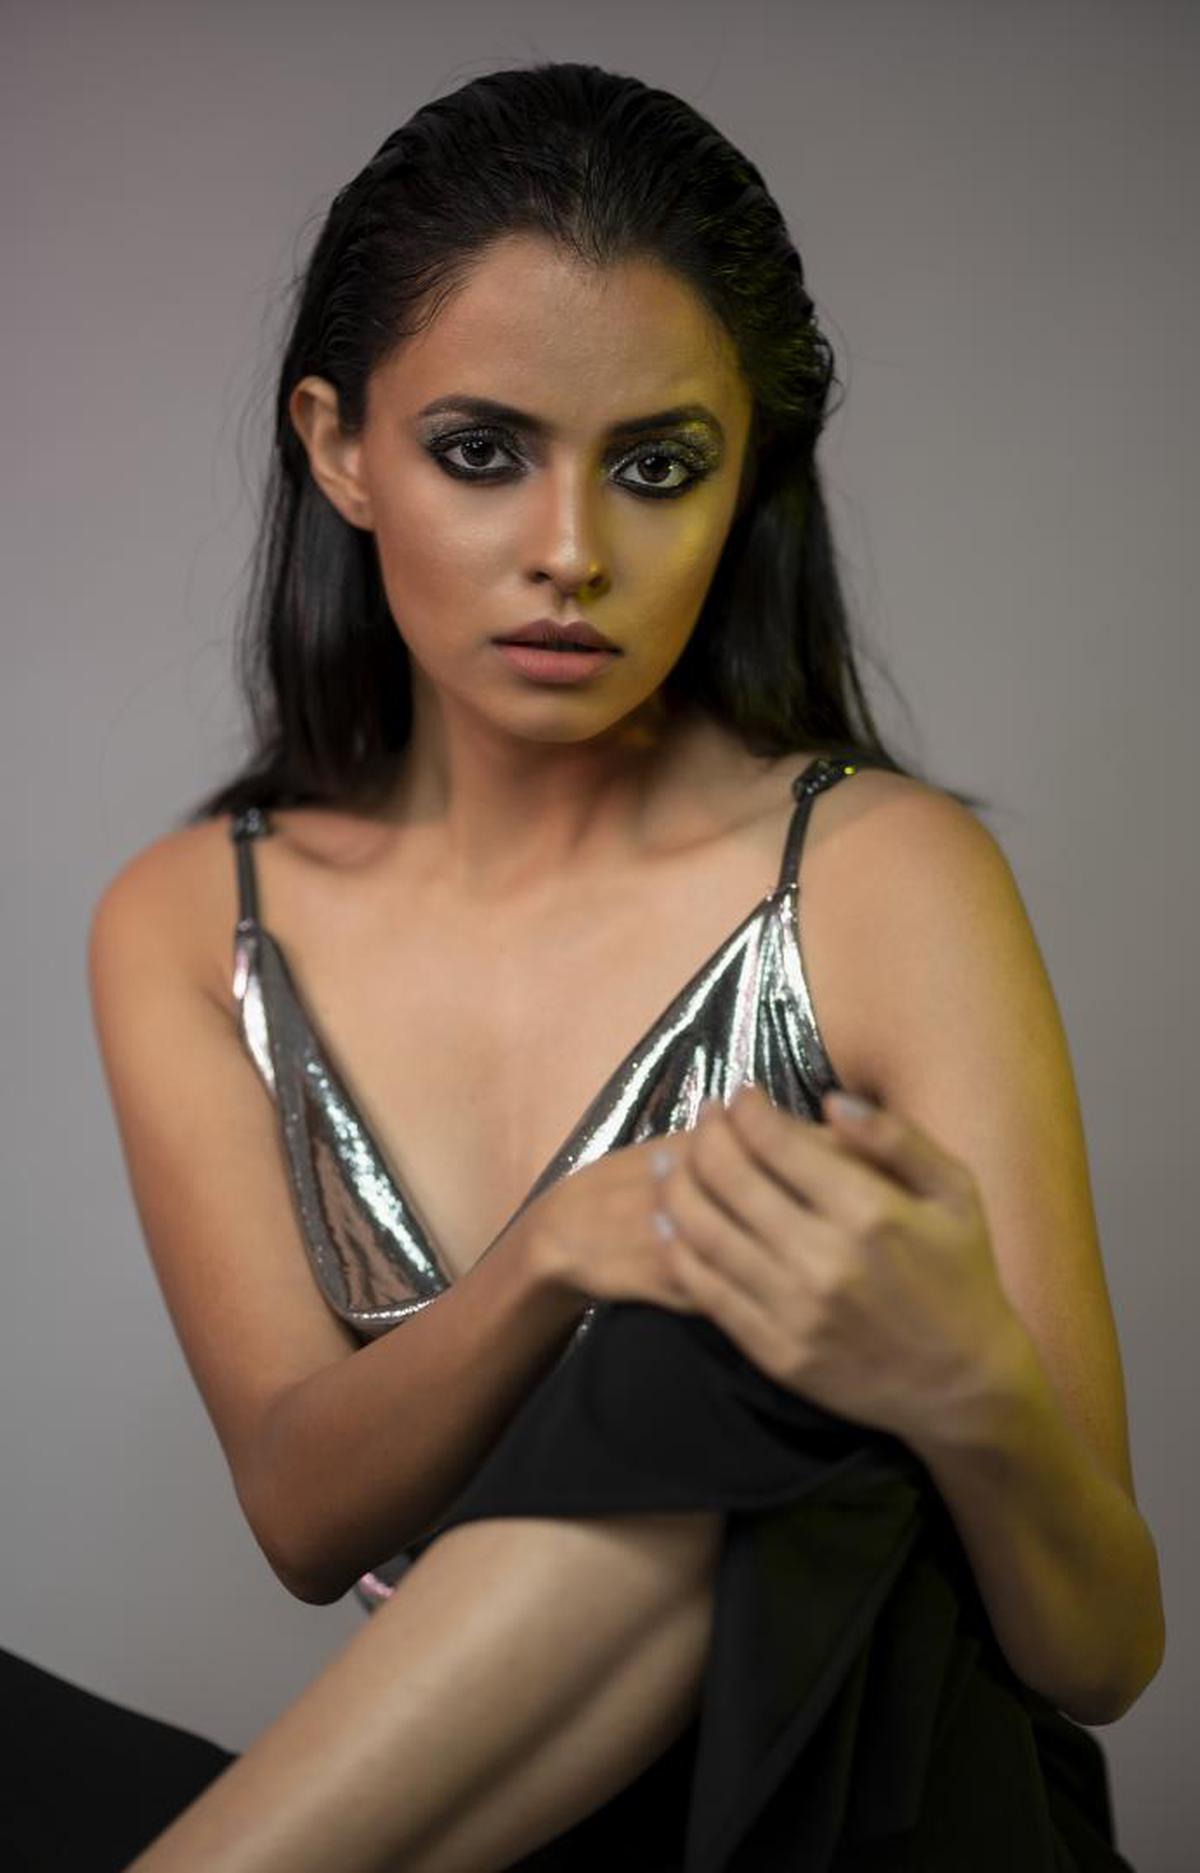 Image of Hair, Face, Photo shoot, Beauty, Lady, Model etc.